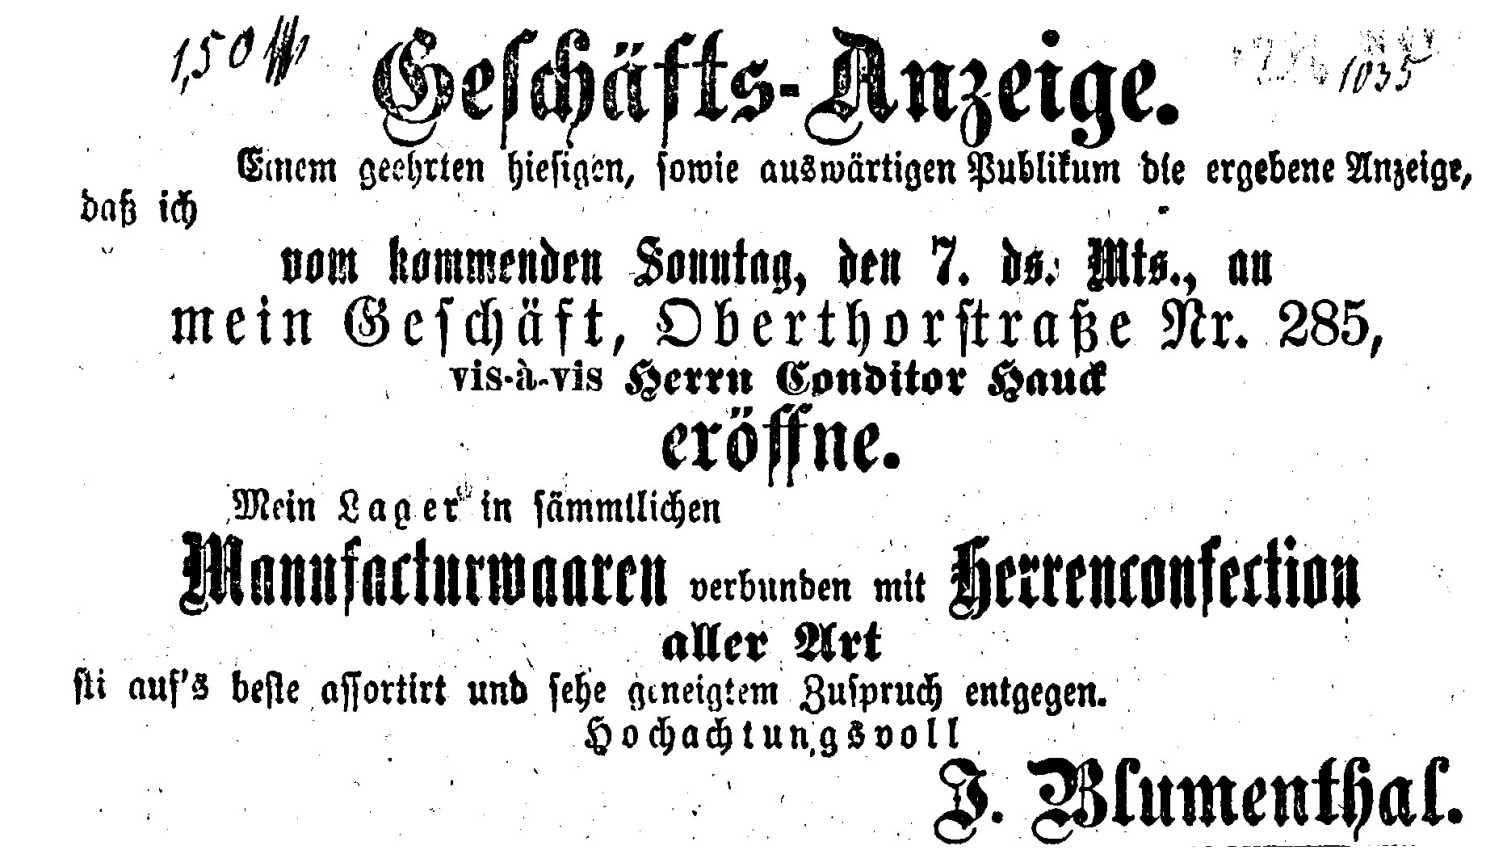 http://www.alemannia-judaica.de/images/Images%20386/Marktheidenfeld%20Blumenthal%2011-1886.jpg